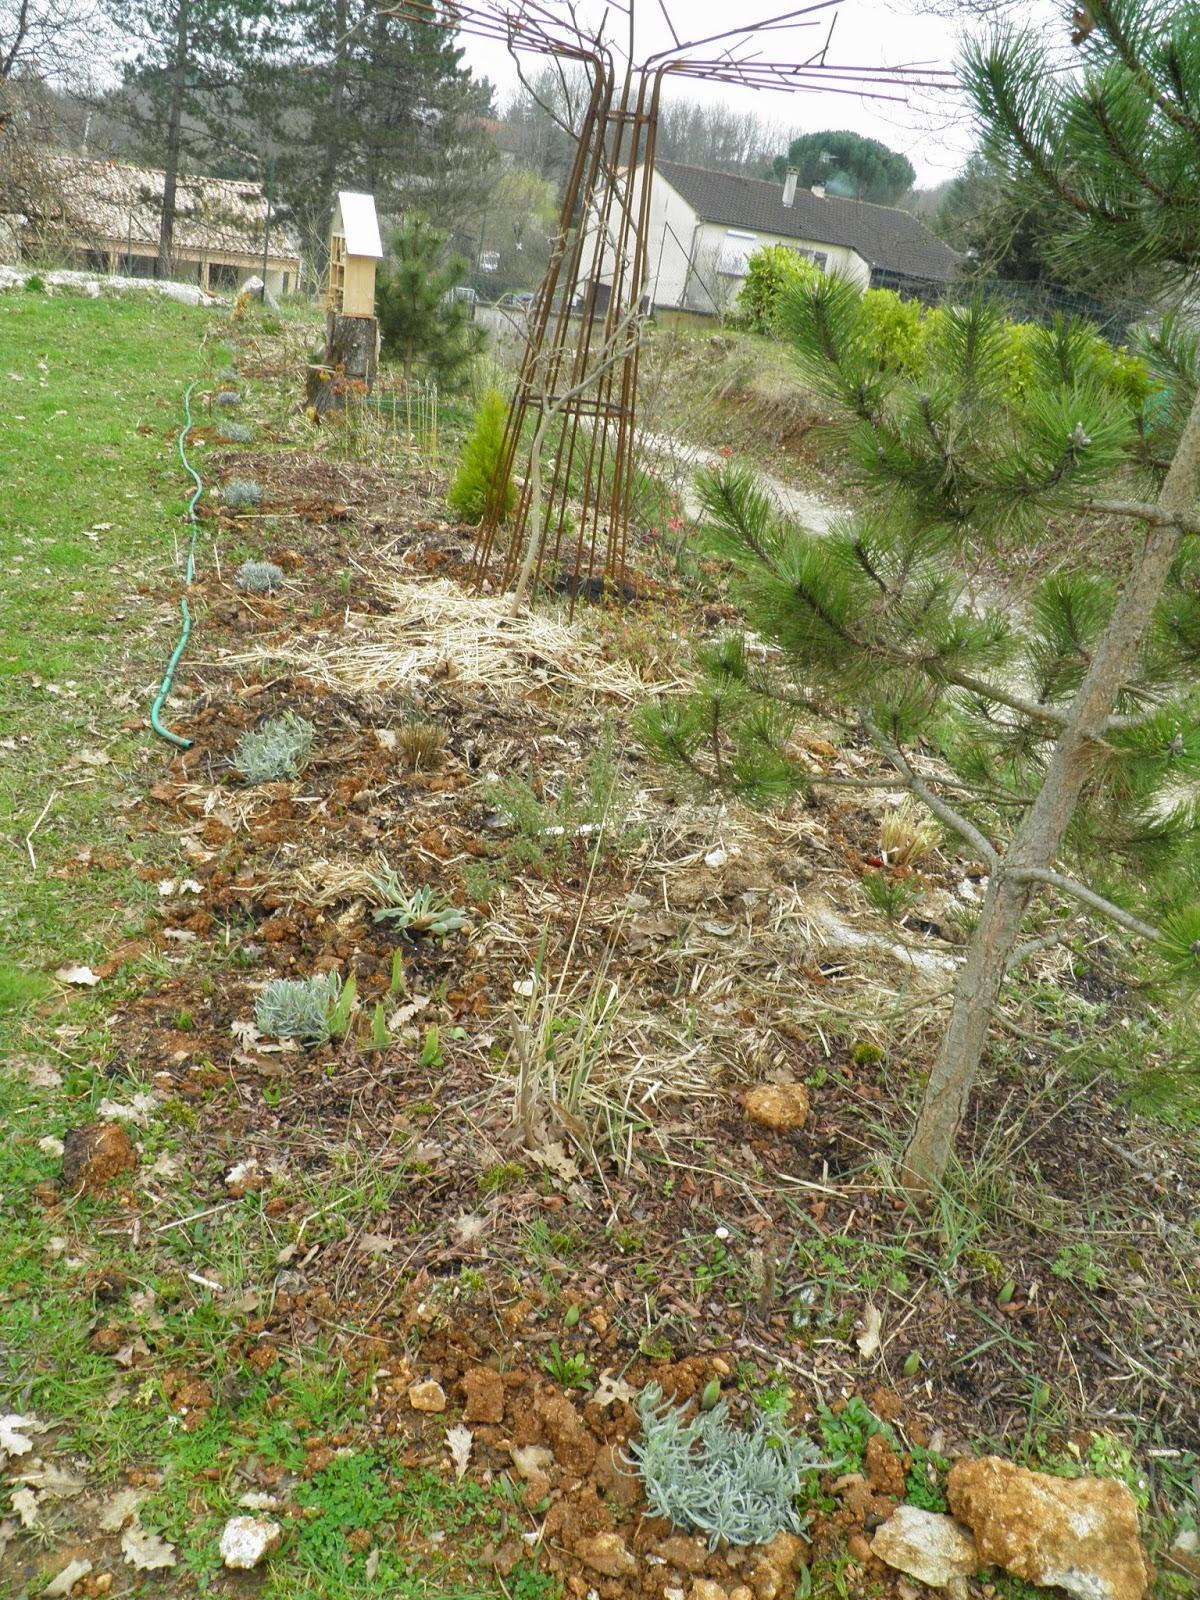 Mon jardin quercynois mi mars au jardin for Jardin mars 2015